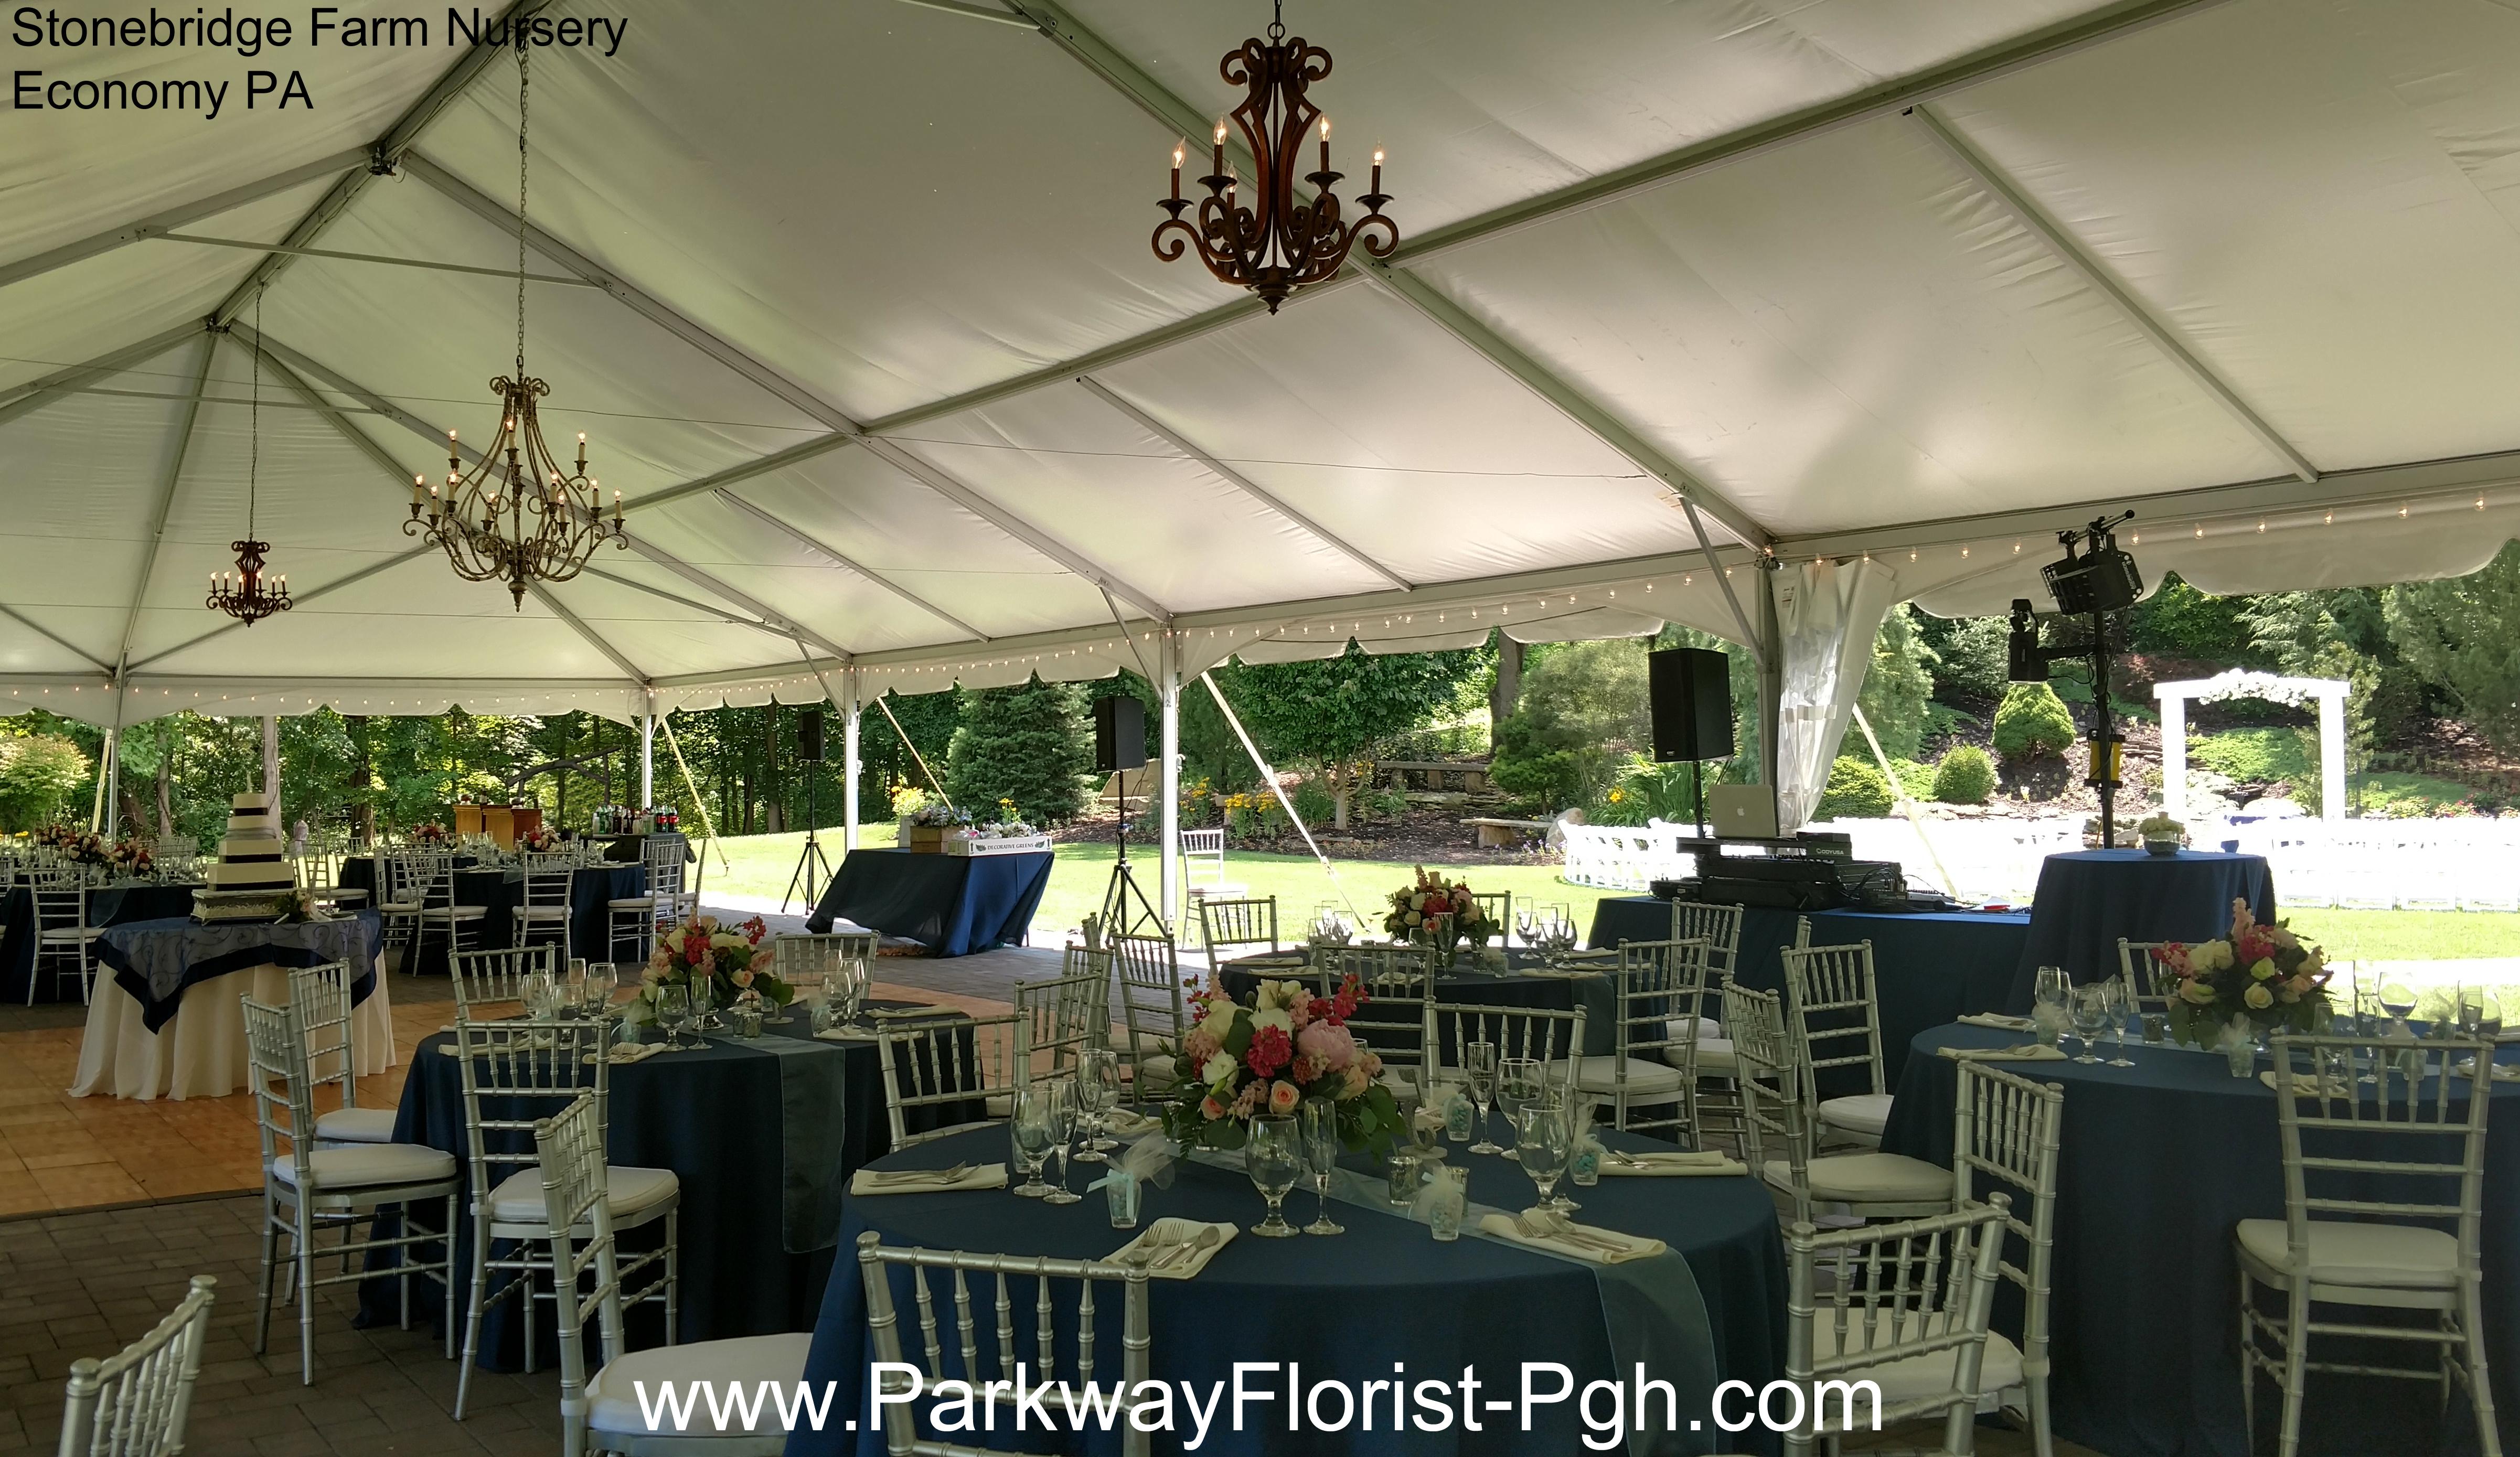 Stonebridge Farm Nursery Economy PA Reception Tent